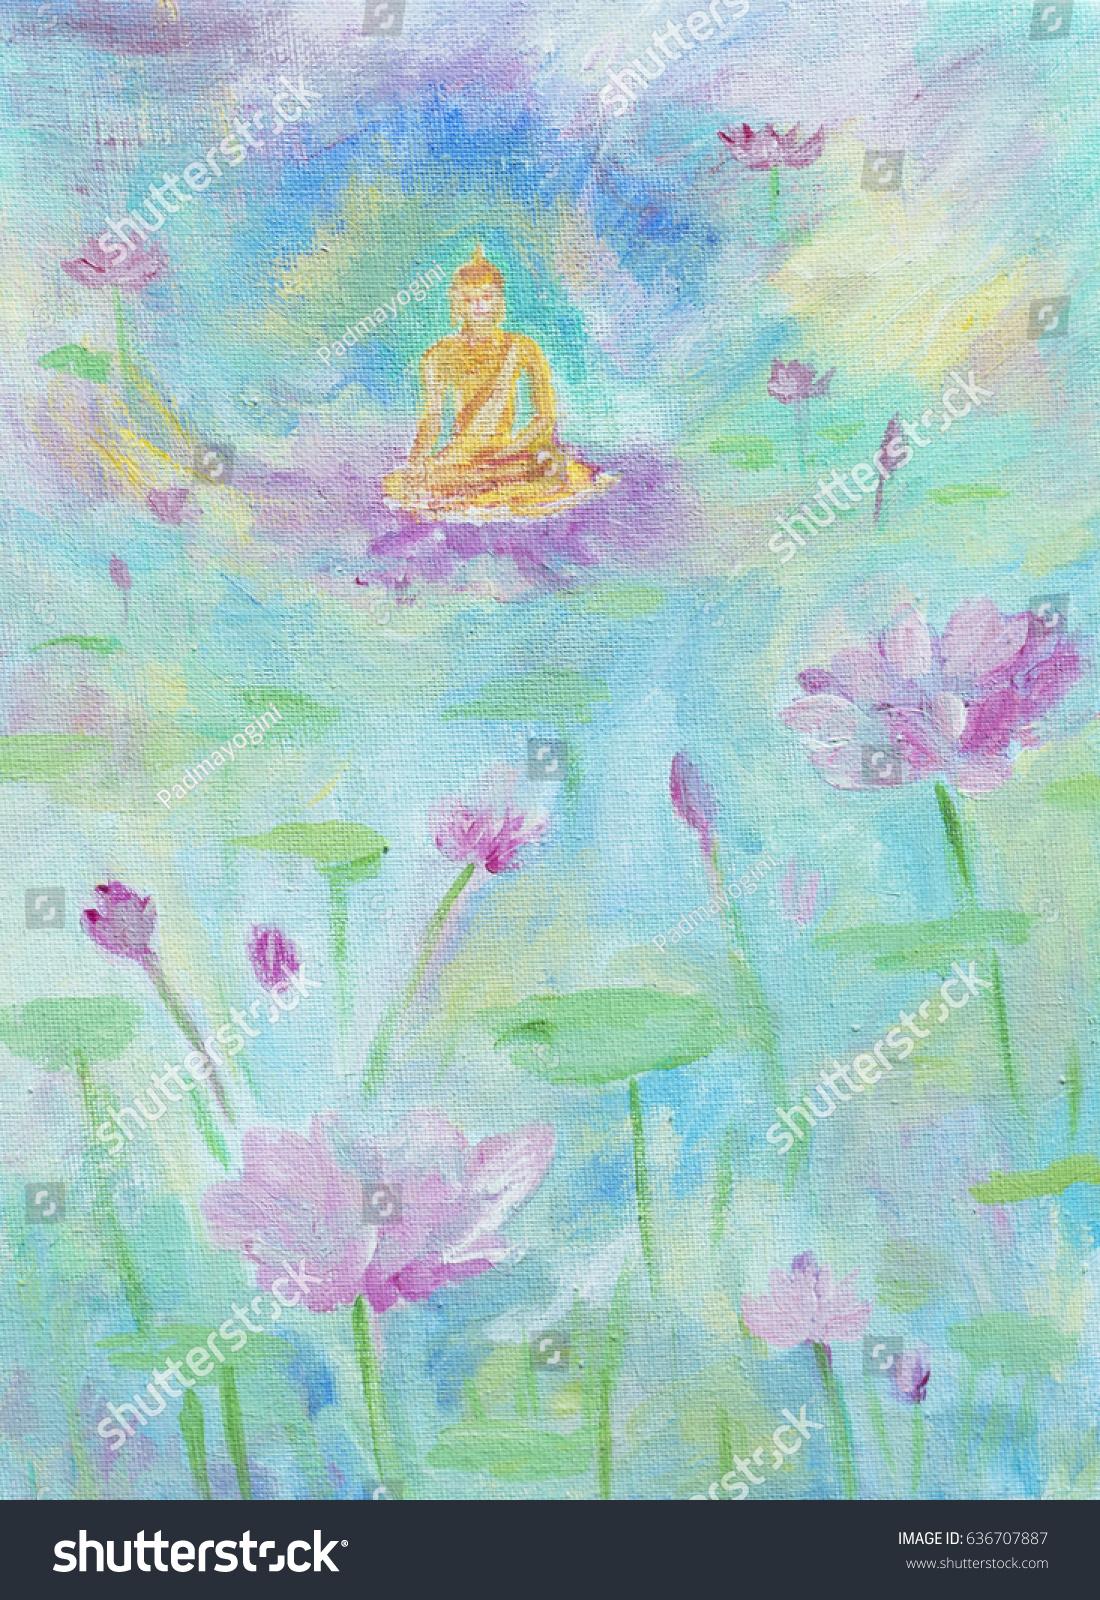 Painting Illustration Golden Buddha Sitting On Stock Illustration